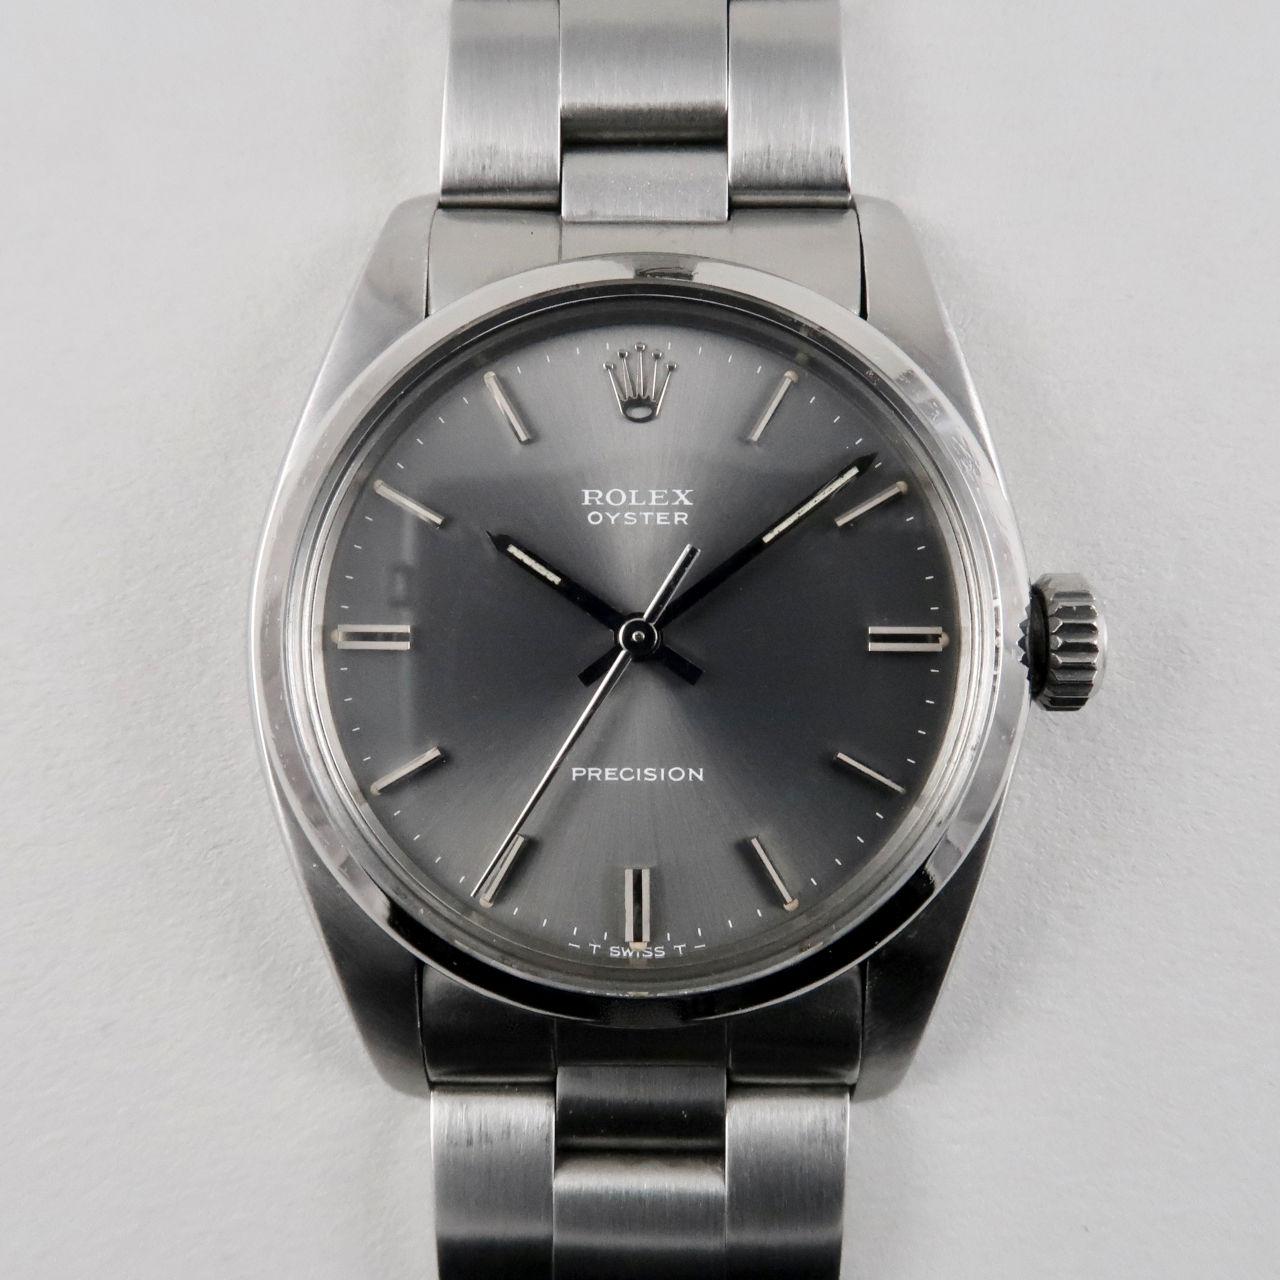 rolex-oyster-precision-ref-6426-steel-vintage-wristwatch-circa-1981-wxropgd-v01